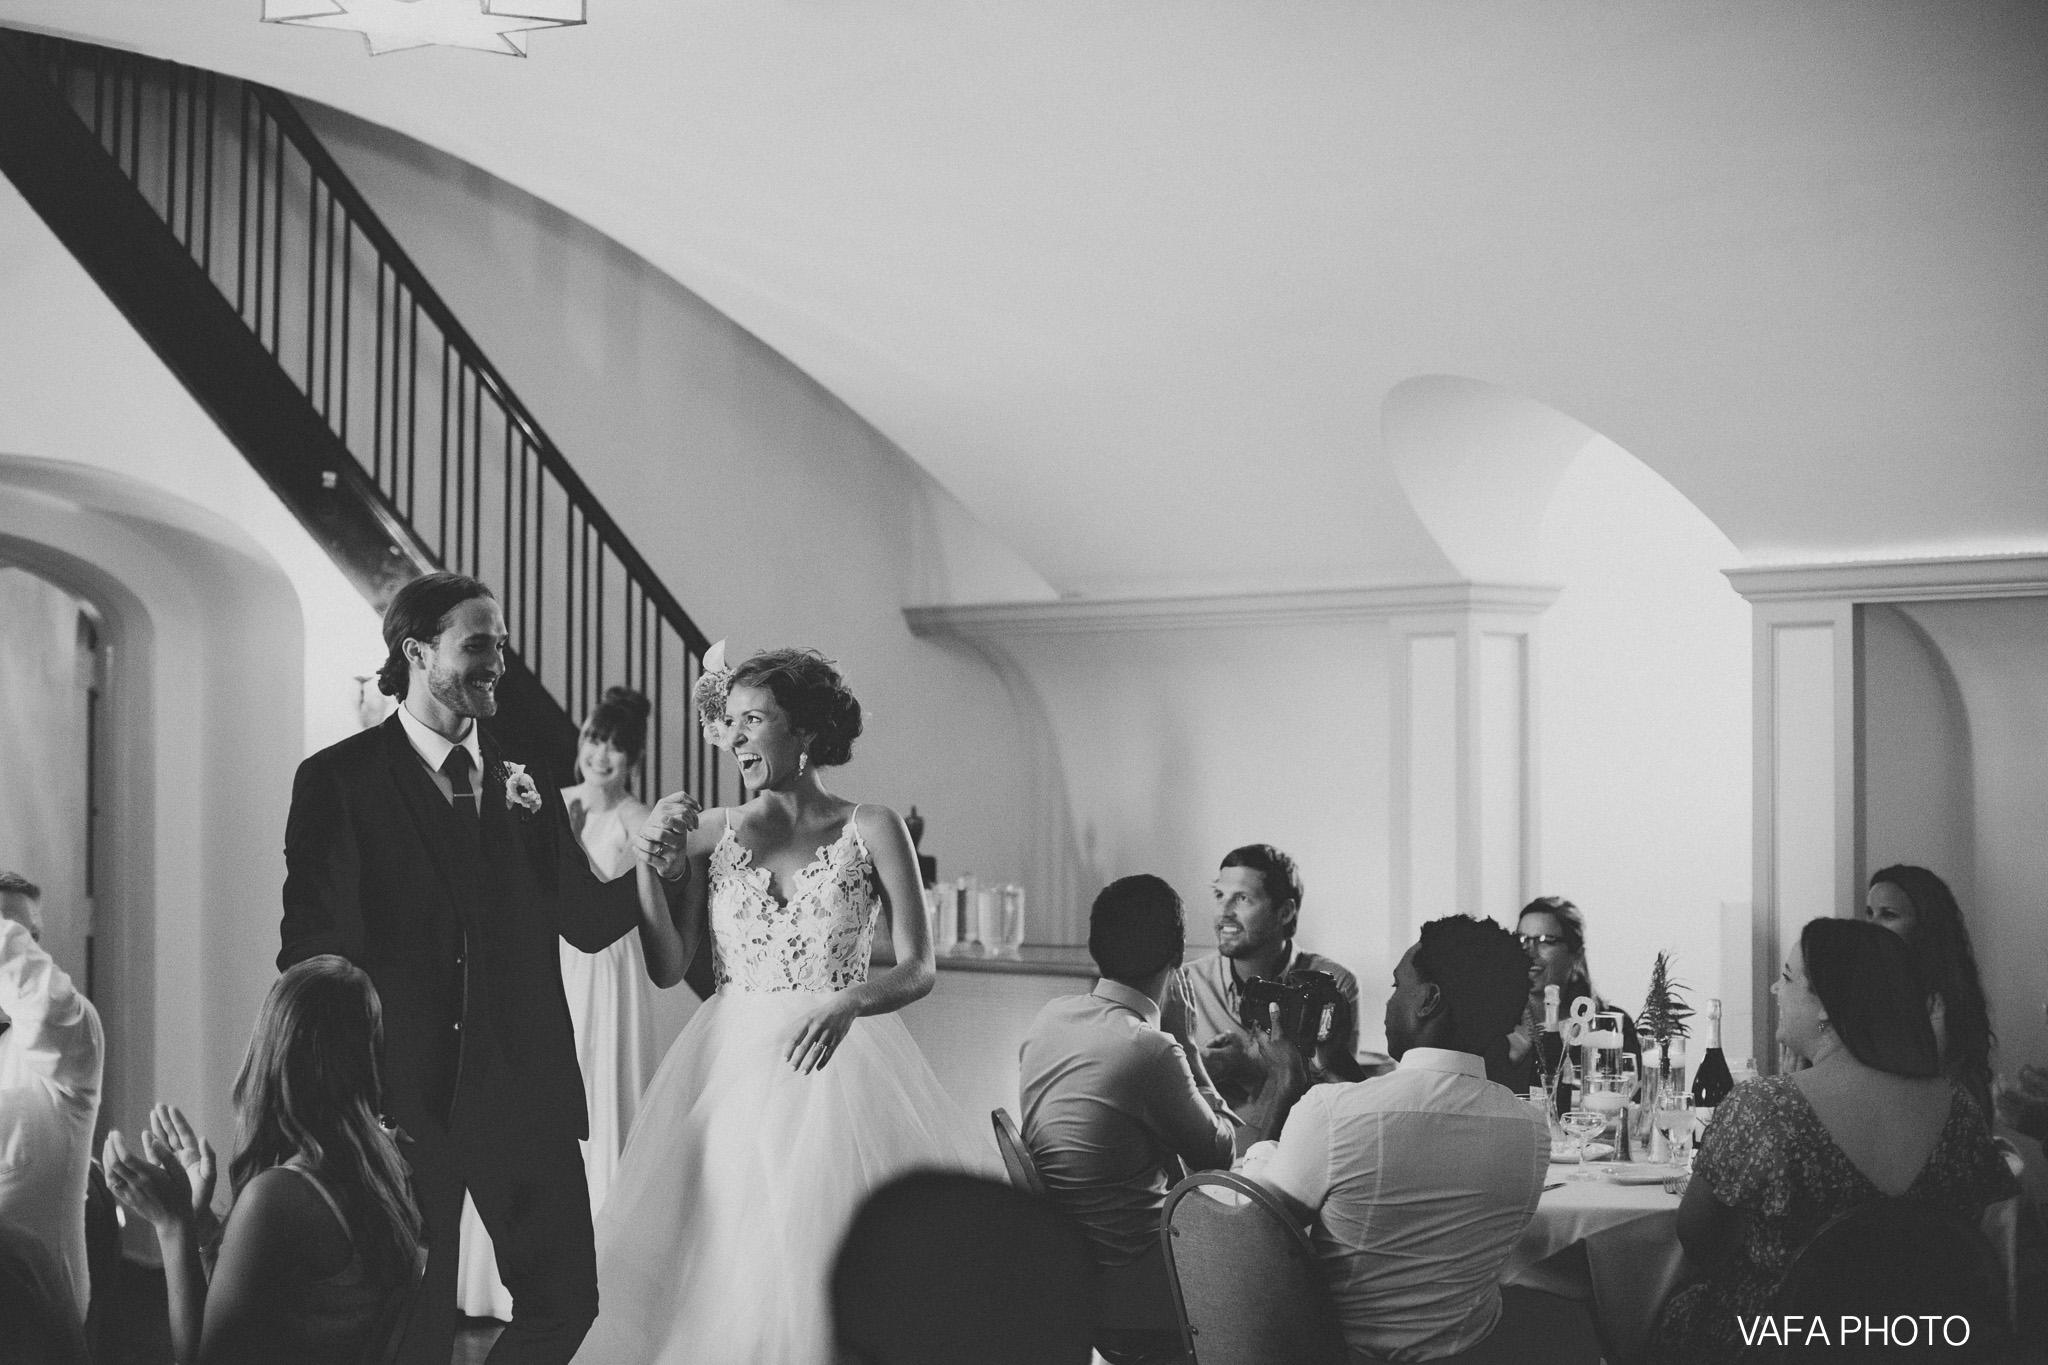 The-Felt-Estate-Wedding-Kailie-David-Vafa-Photo-927.jpg